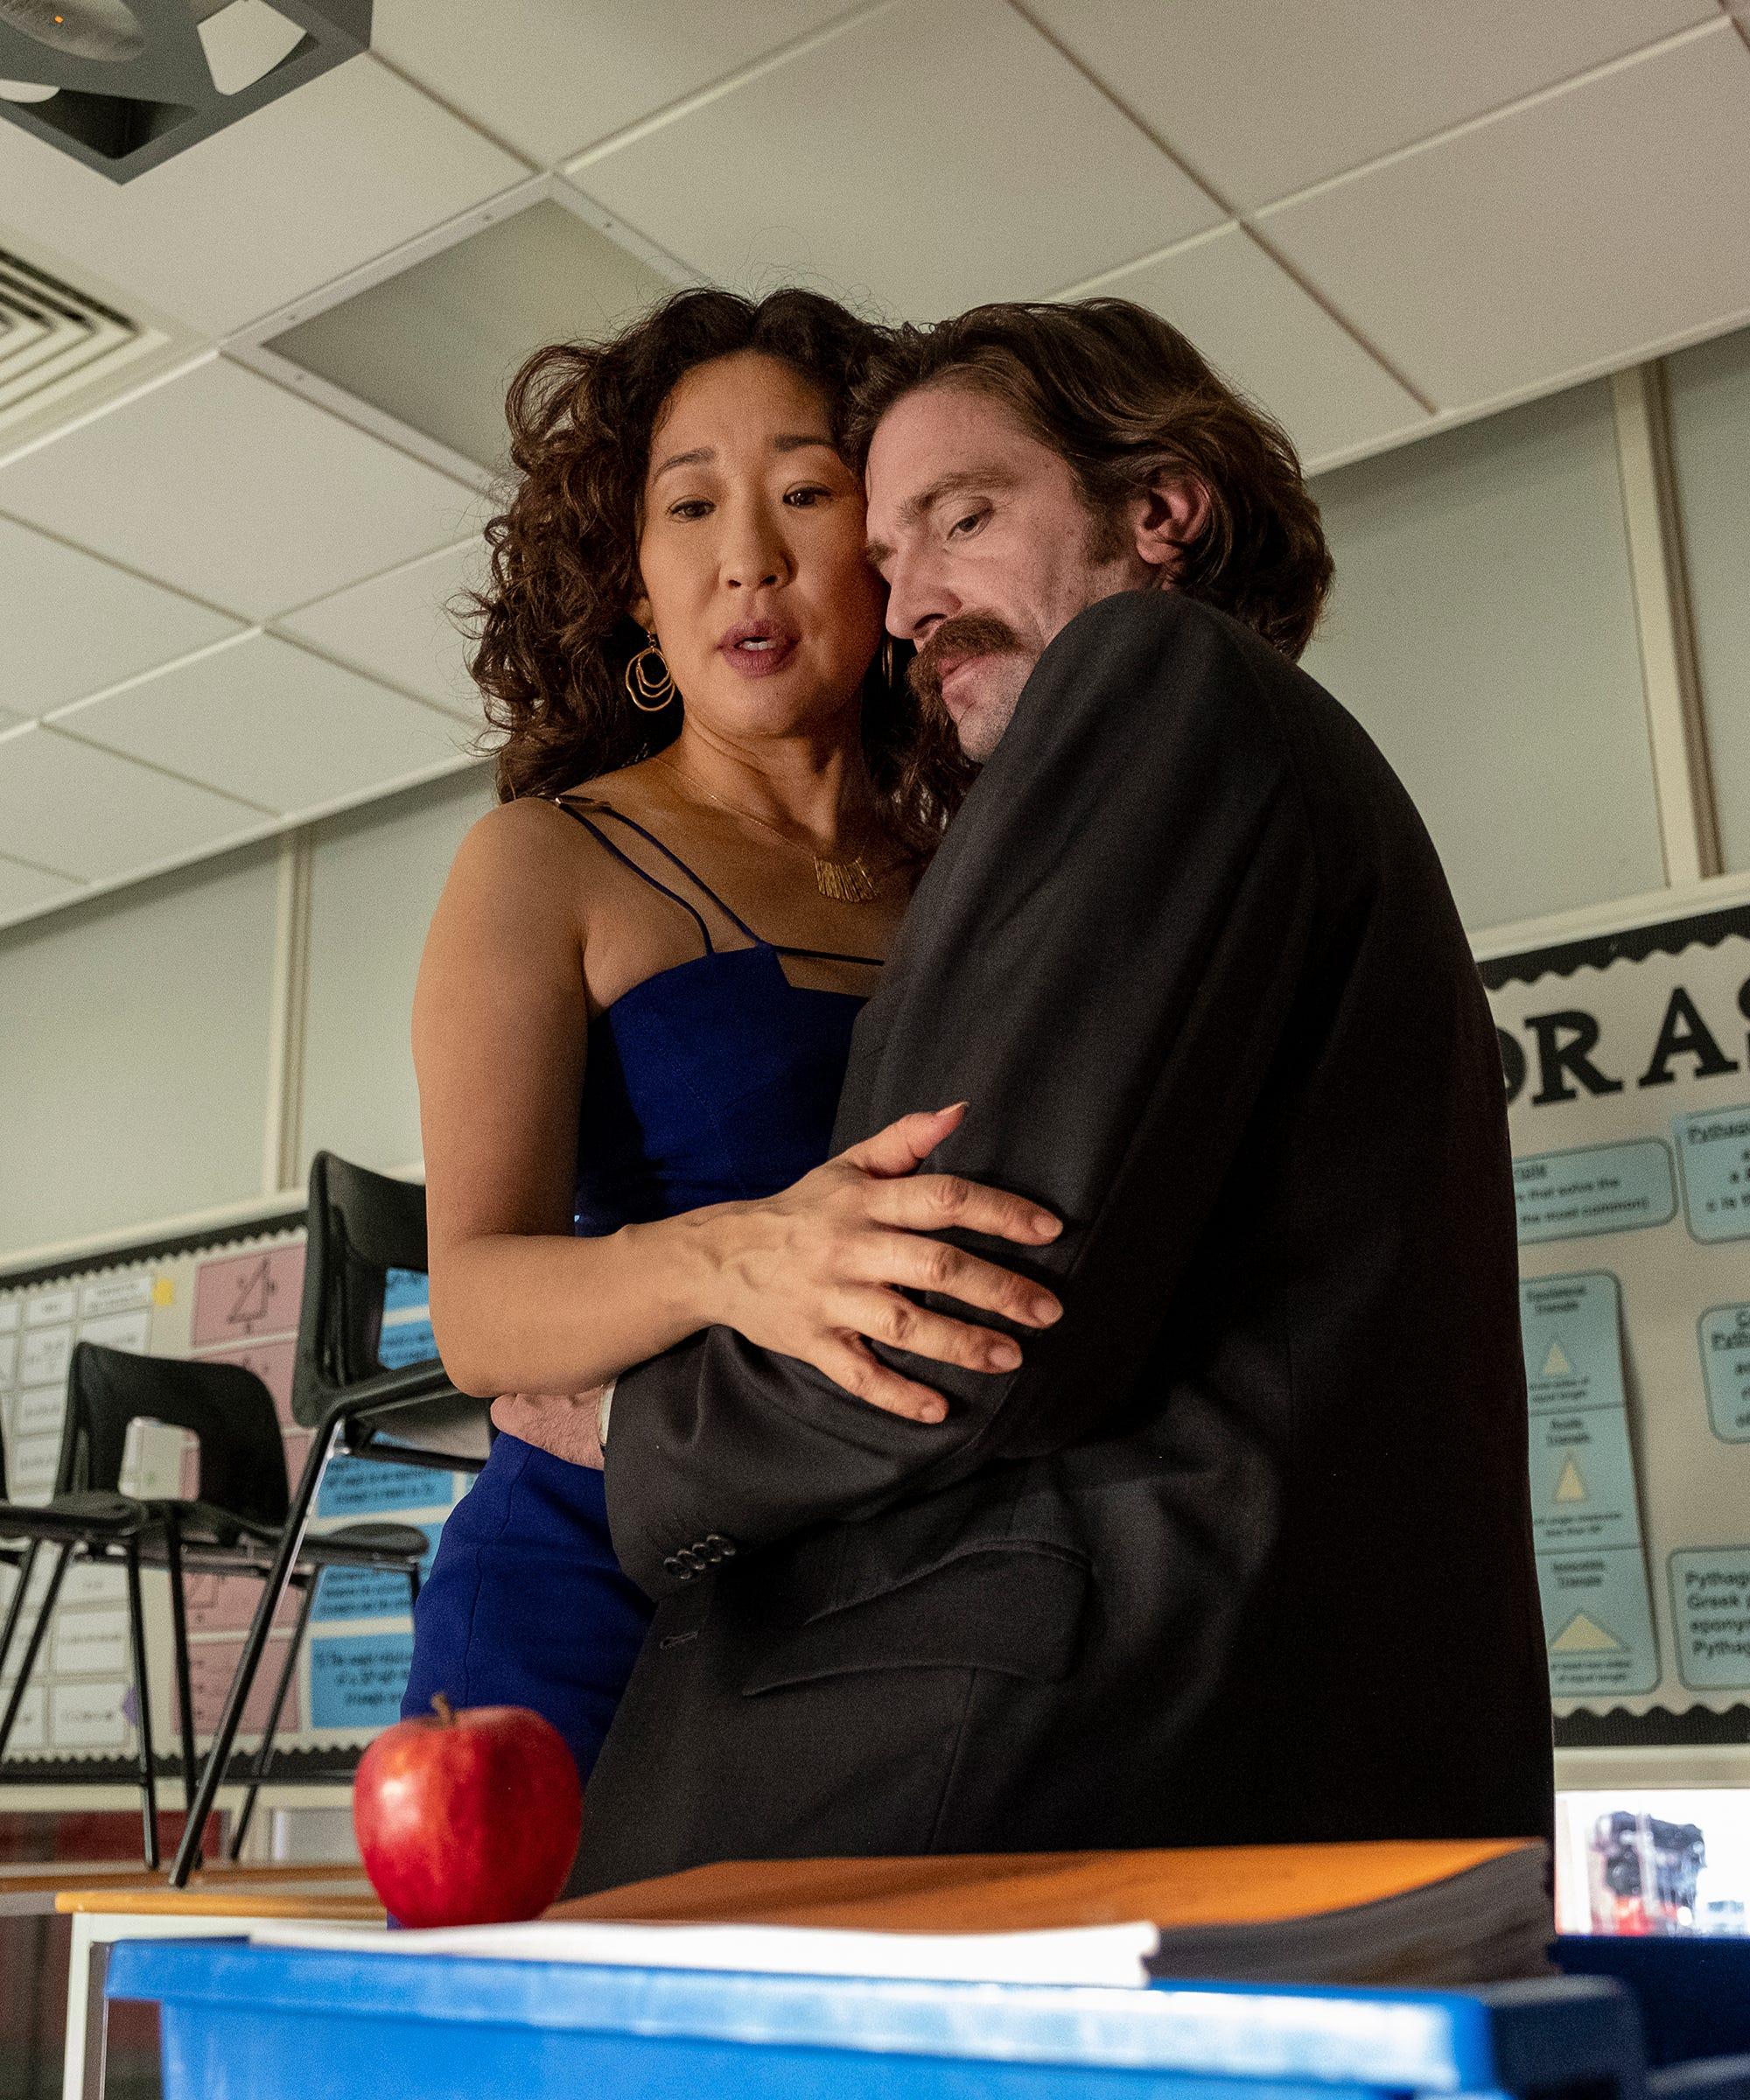 Killing Eve Season 2 Episode 3 Recap: Listen To Your Heart